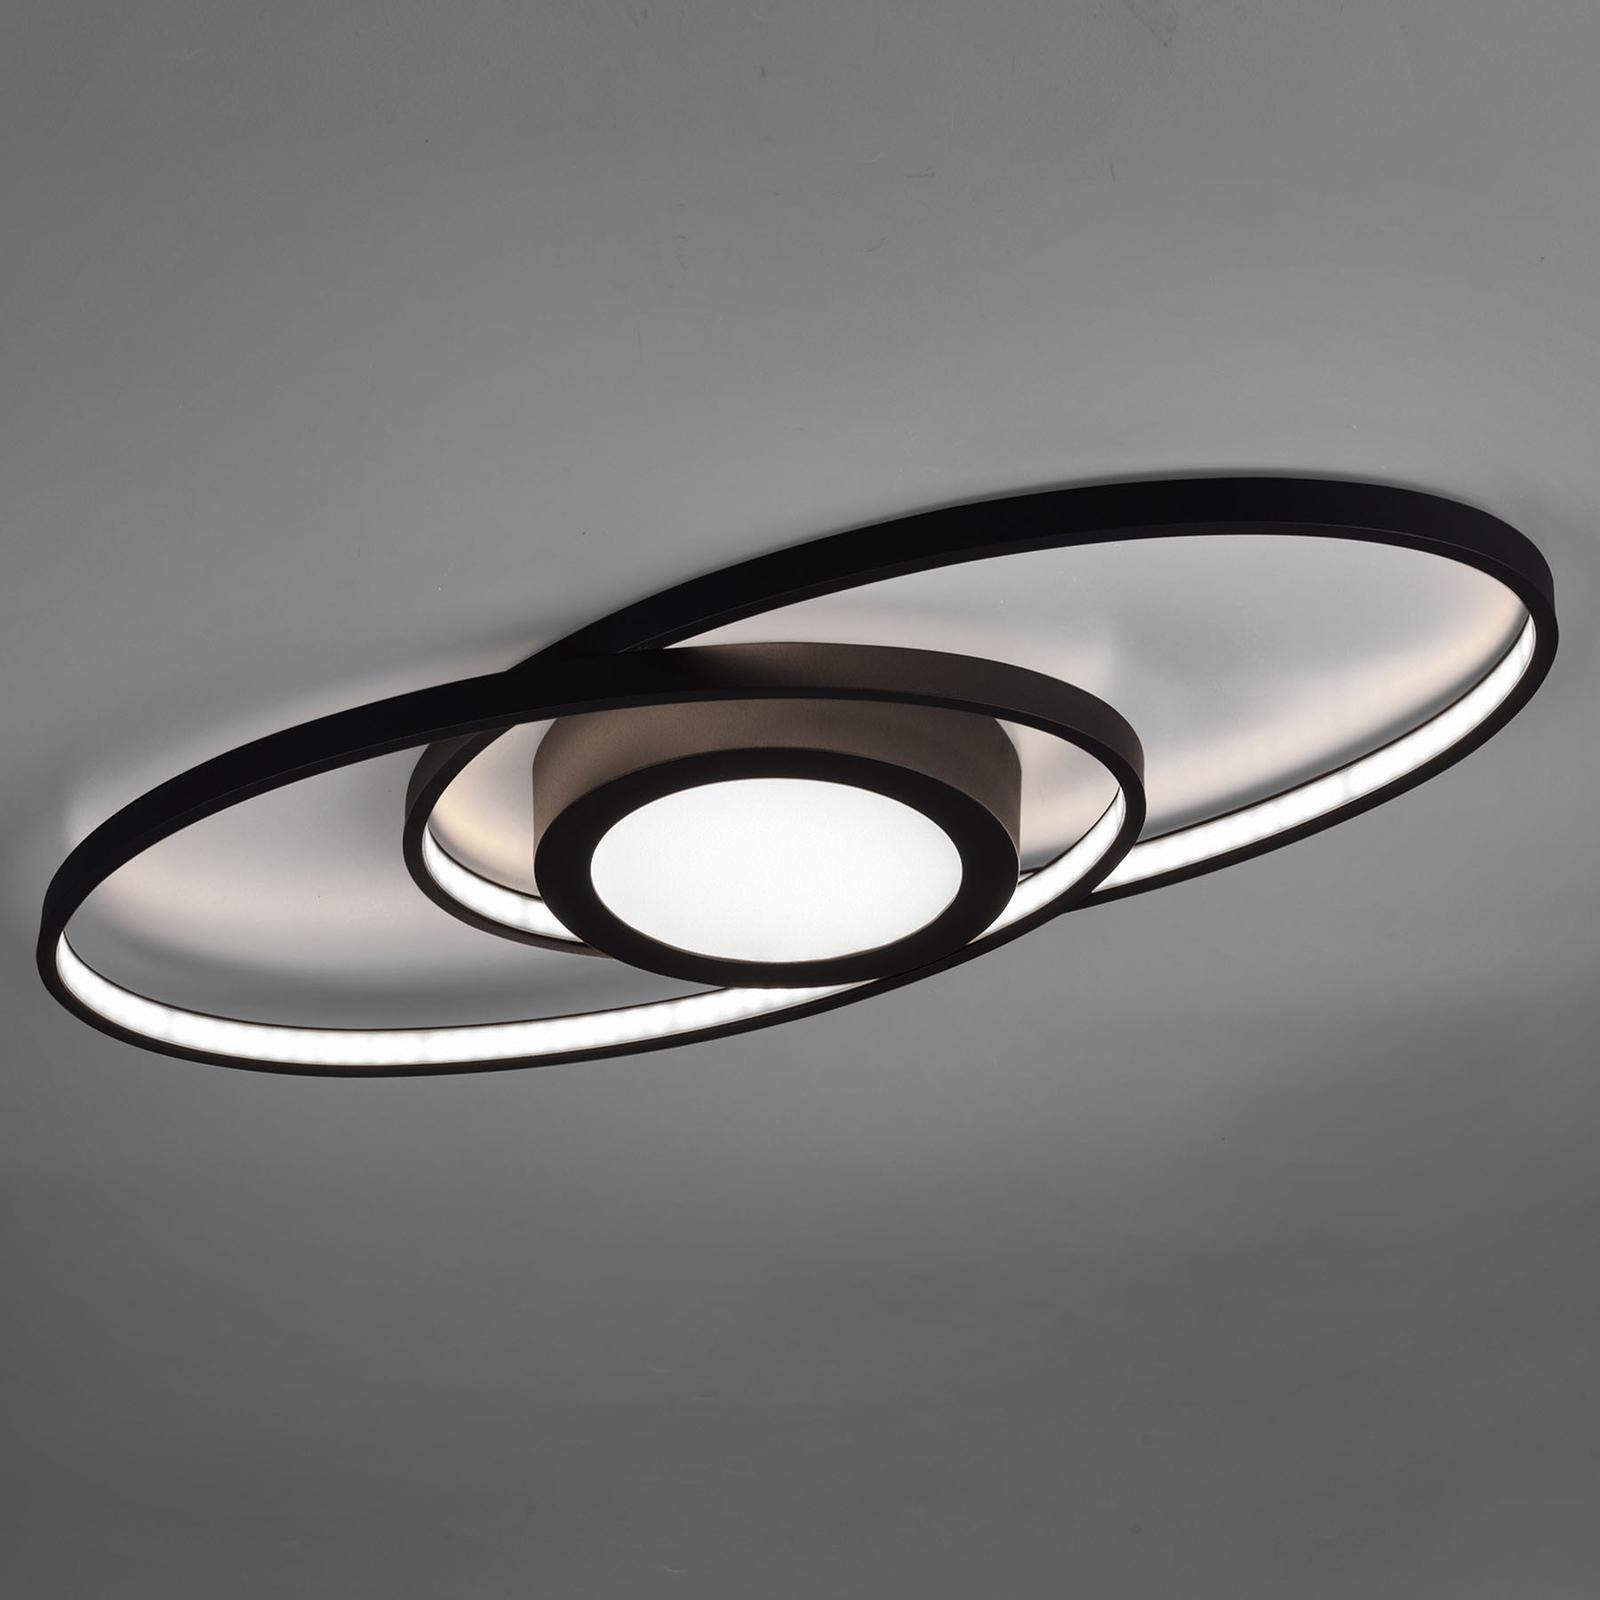 Lampa sufitowa LED Galaxy, ściemniana, antracyt